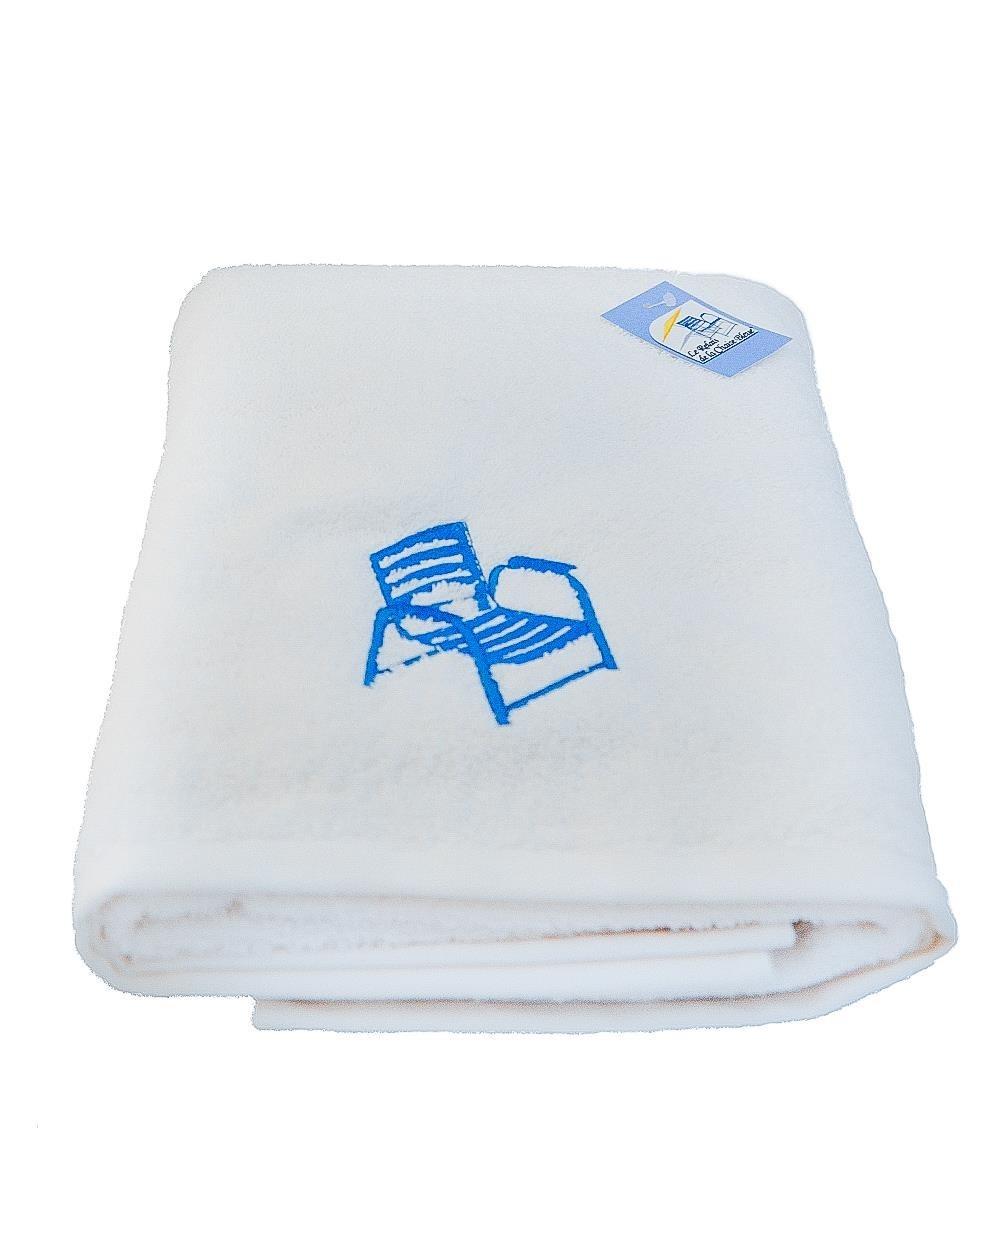 Copy of drap de bain bleu 70x140 cm - Drap de bain rond ...